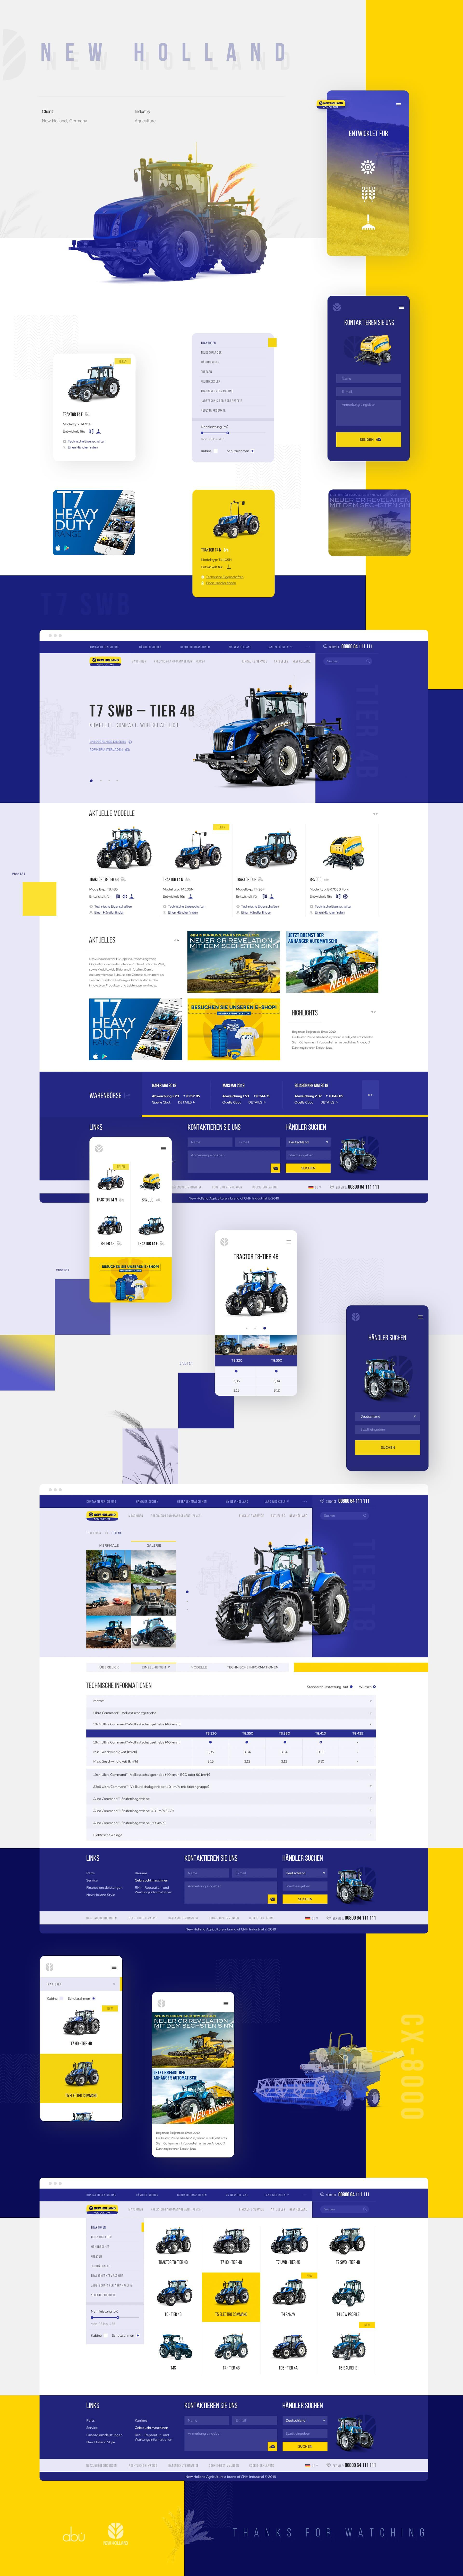 NEW HOLLAND AGRICULTURE - Официальный дилер в Дрездене, Германия